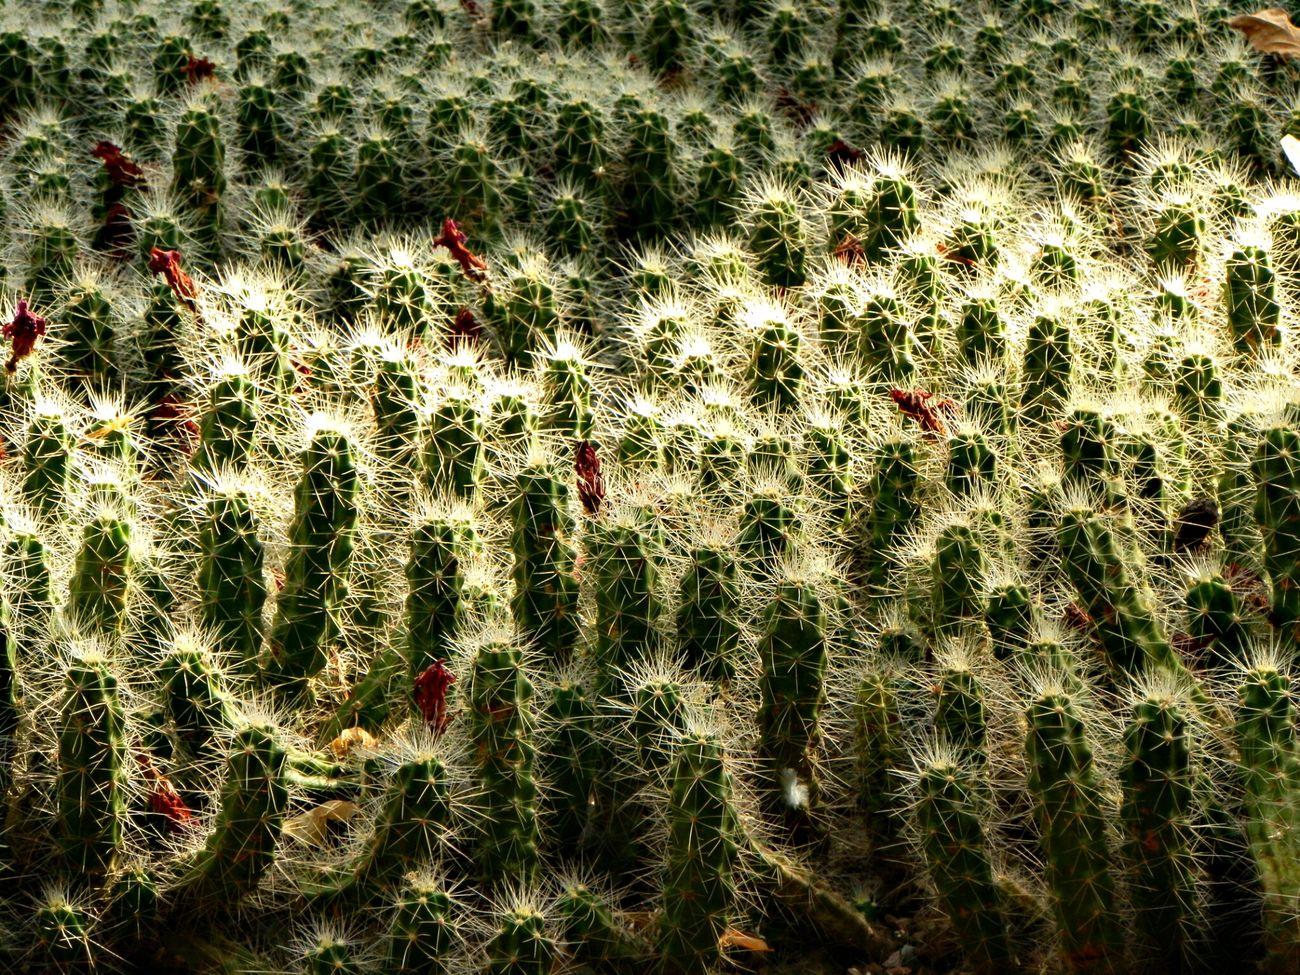 EyeEm Best Shots EyeEm Nature Lover Nature_collection Naturelovers